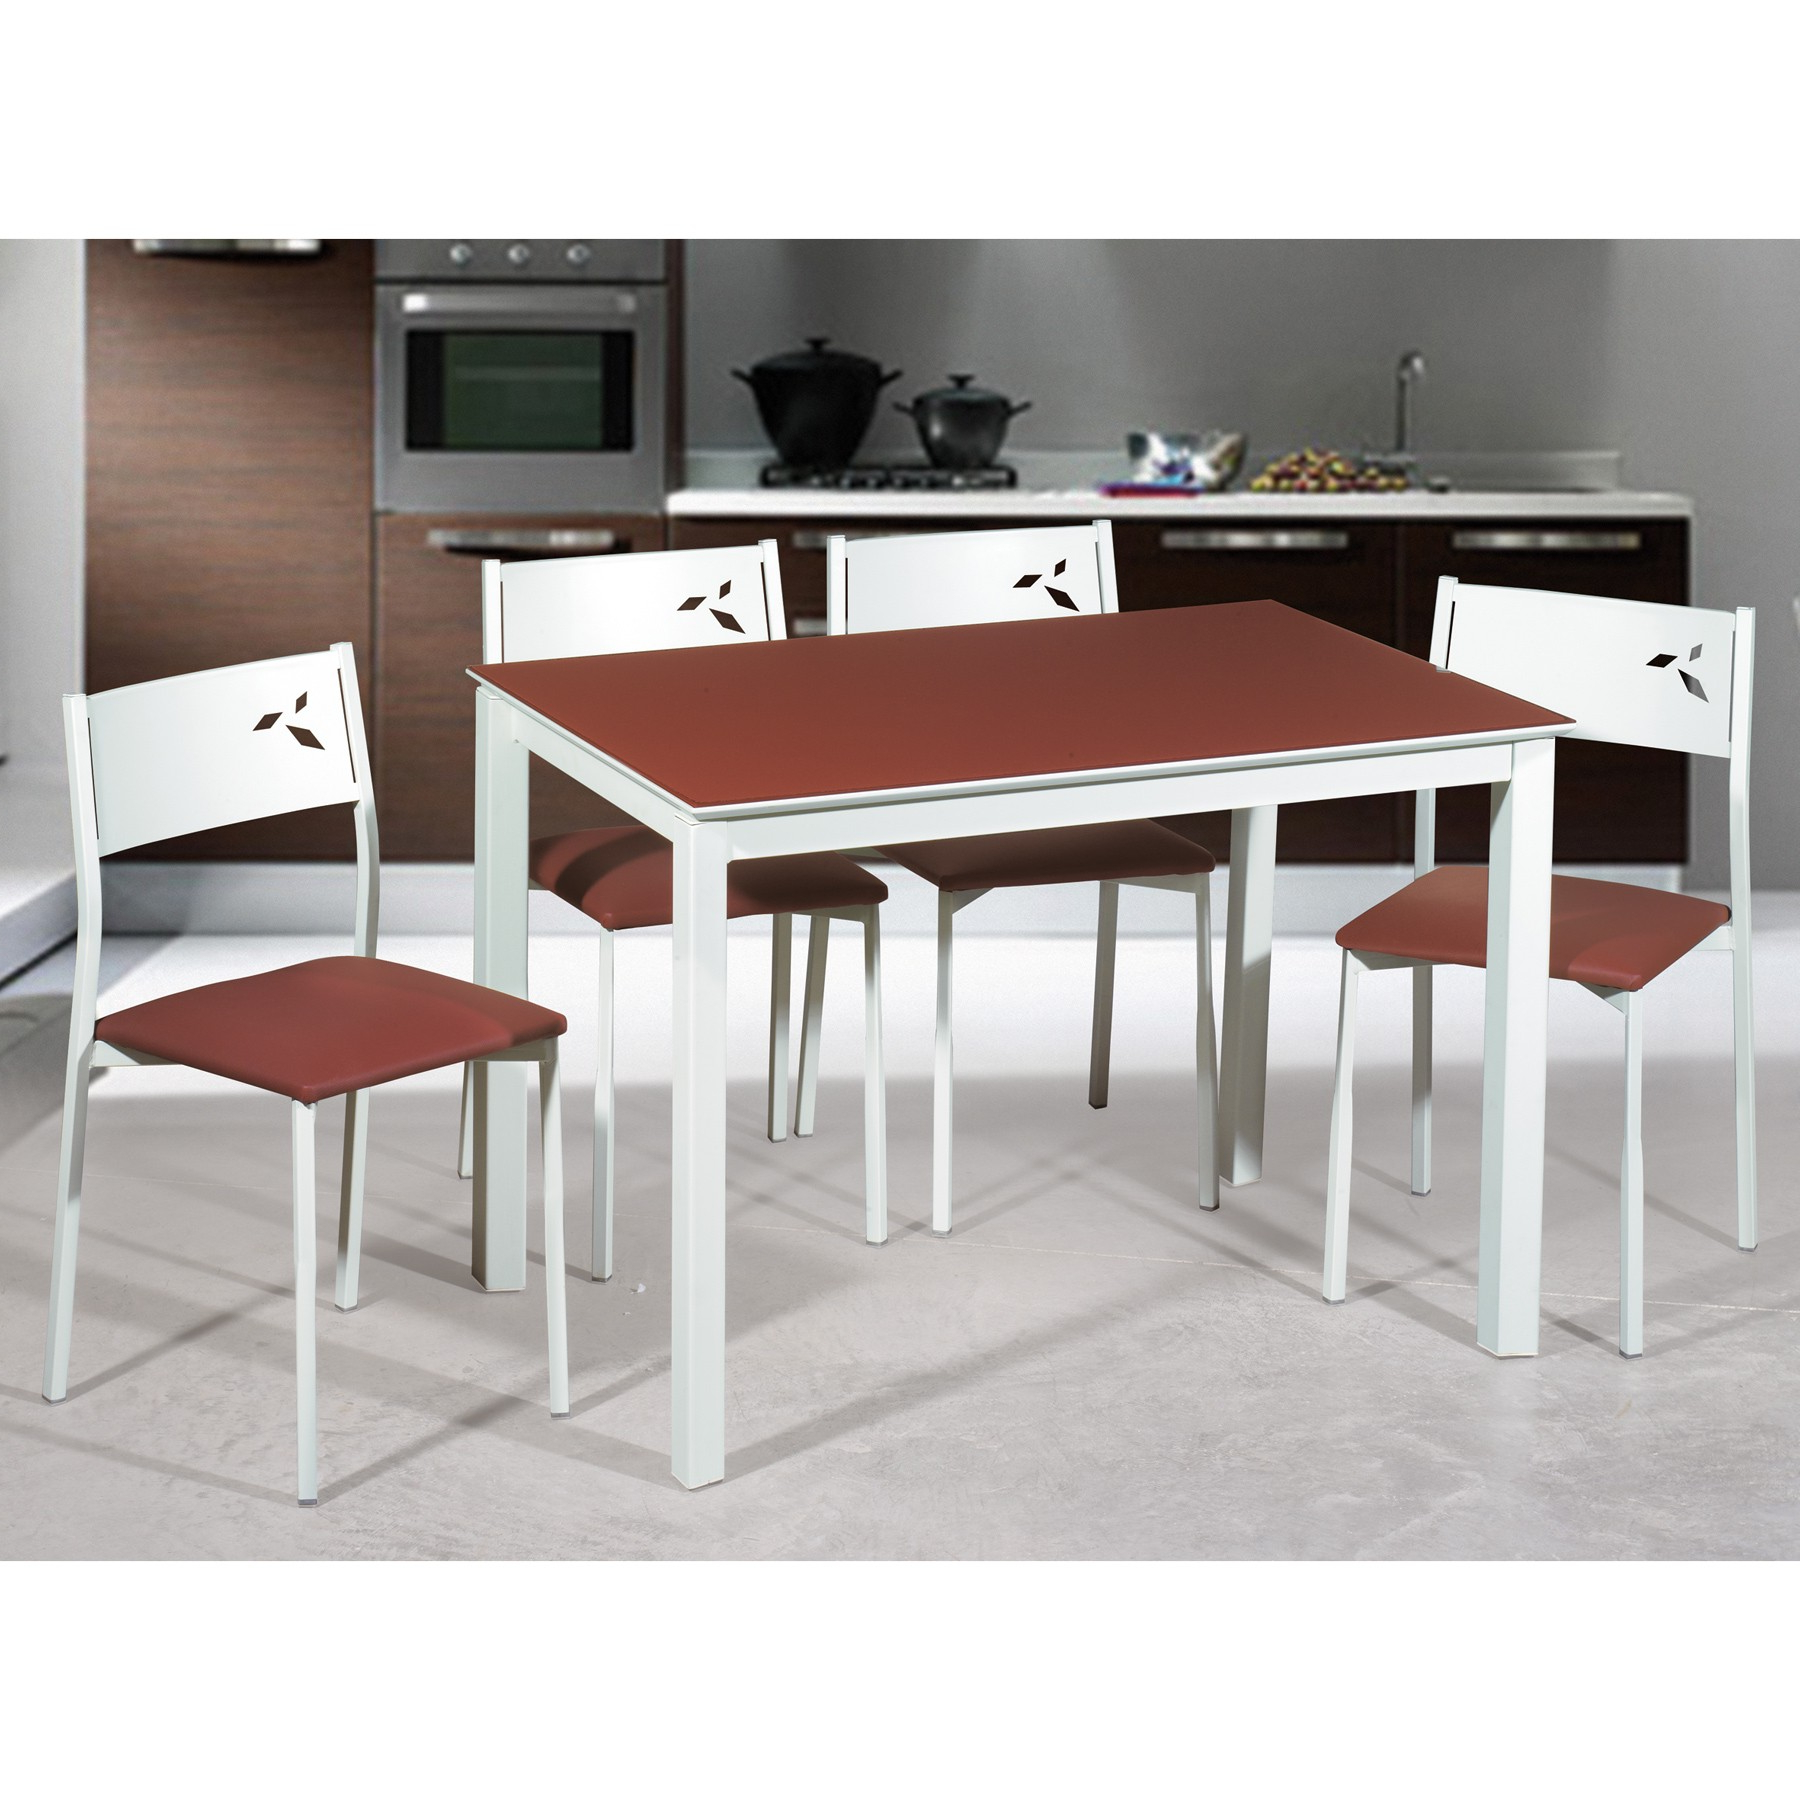 2ed87cc5fa71e Mesa Cocina Blanca Etdg Oferta Conjunto Mesa Y Sillas De Cocina Blancas  White